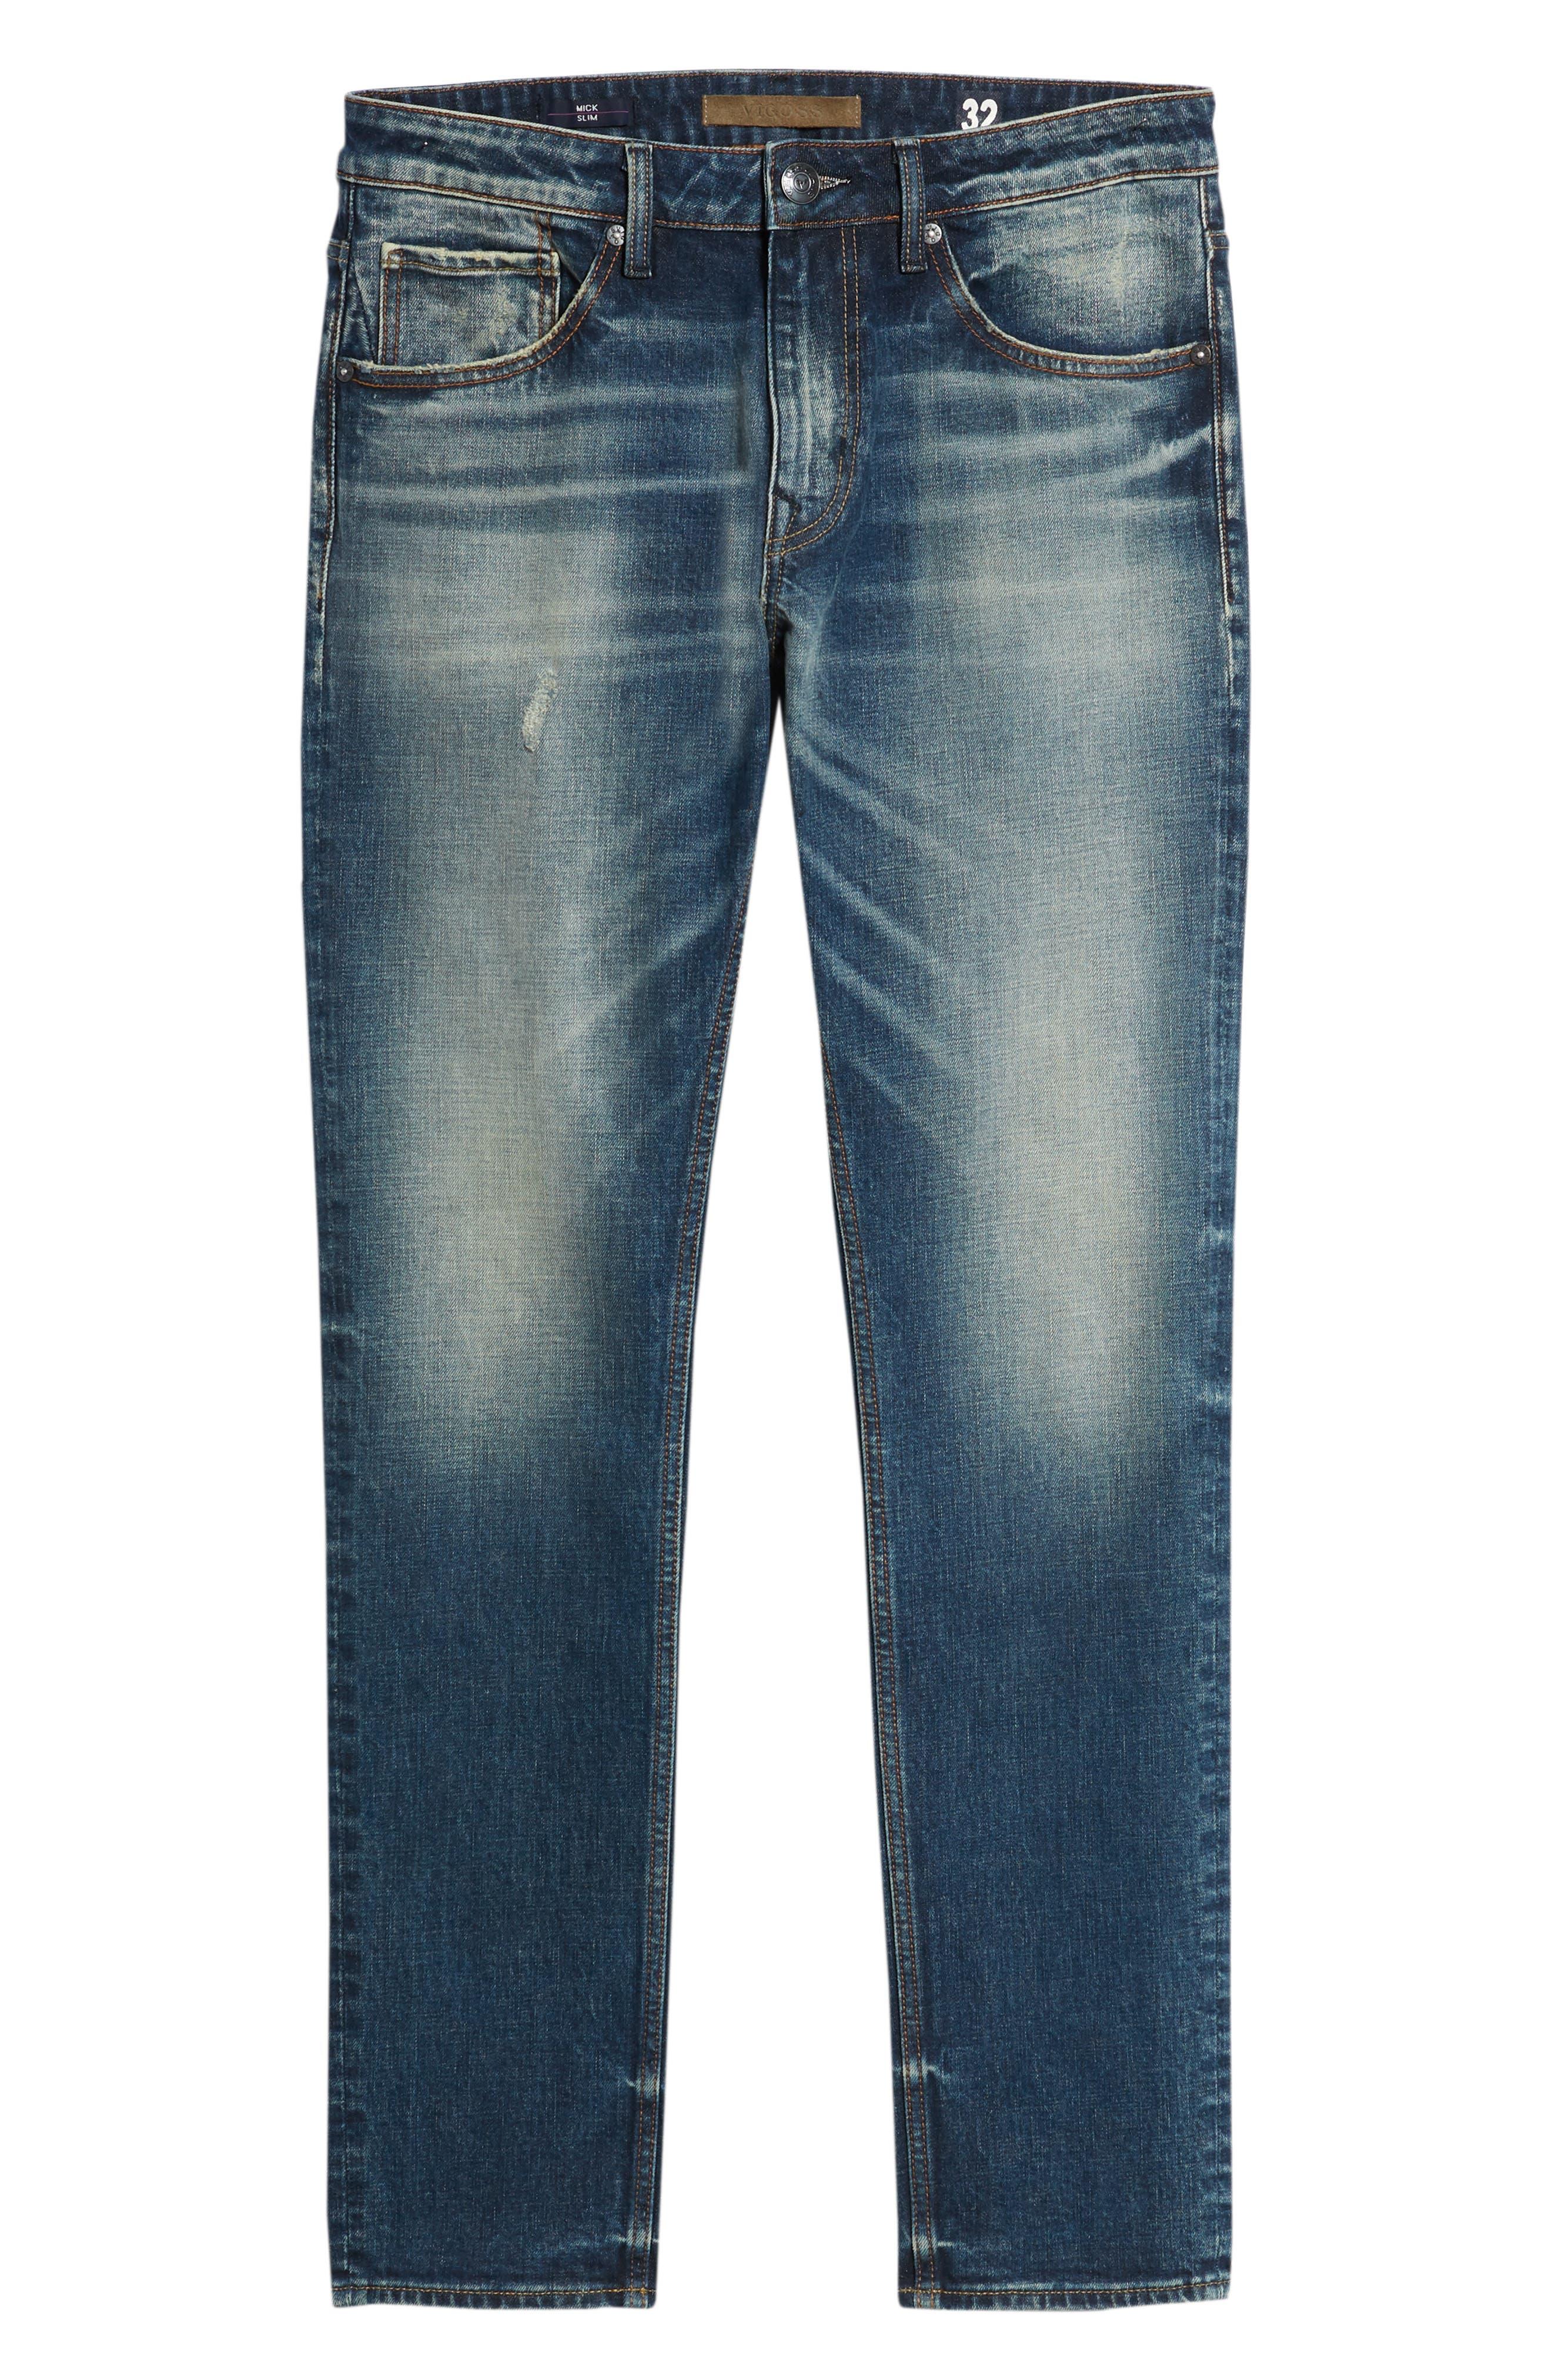 Mick Slim Fit Jeans,                             Alternate thumbnail 6, color,                             VINTAGE WASH